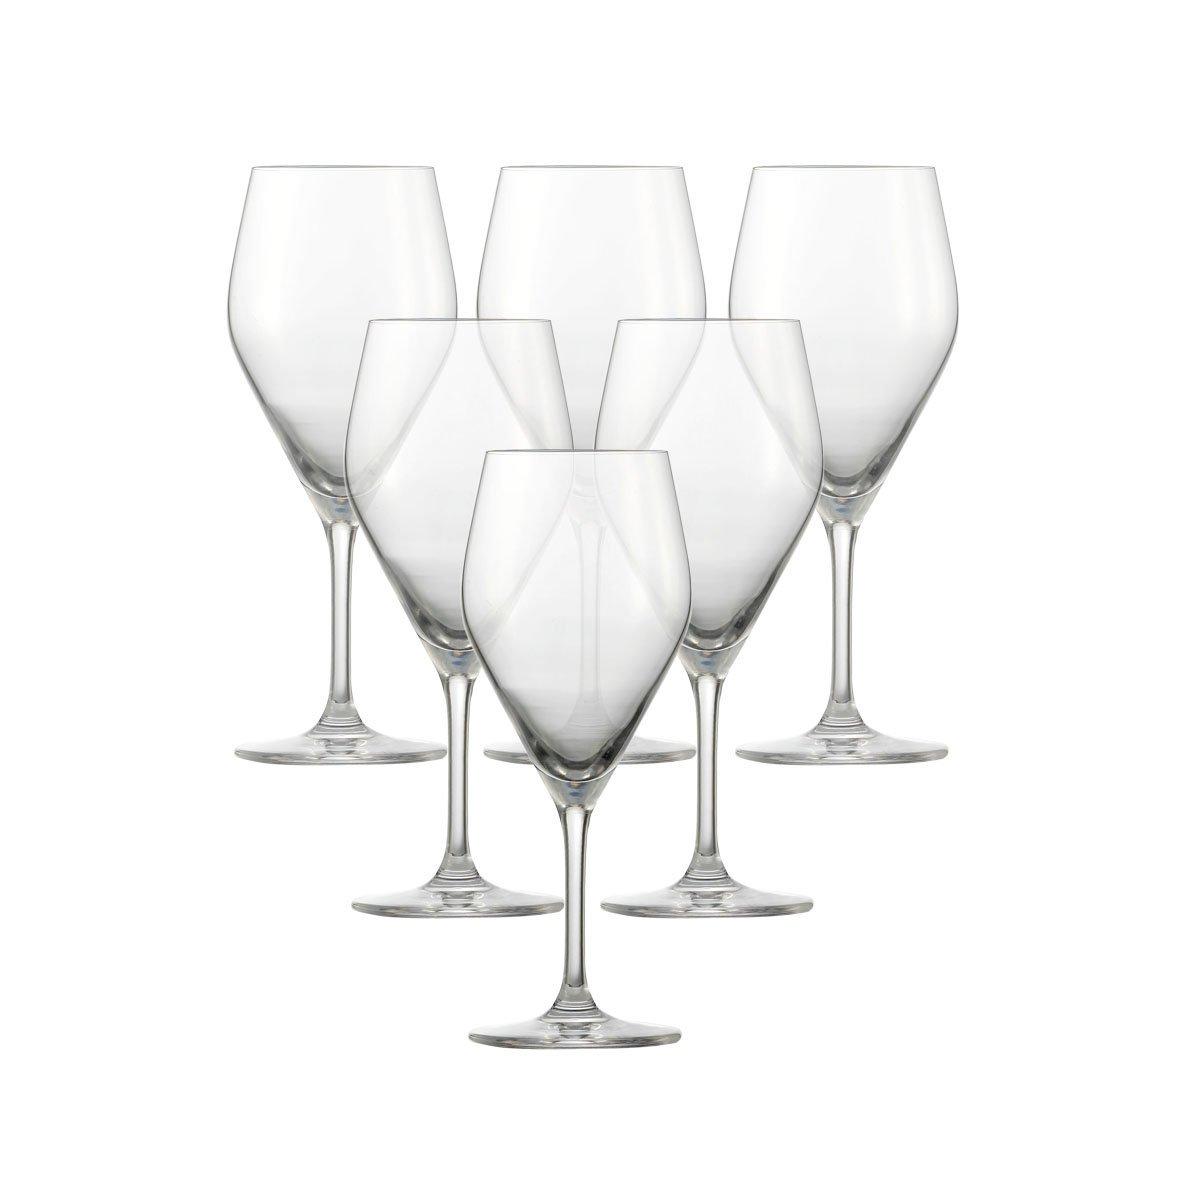 Schott Zwiesel Weißweinglas amazon